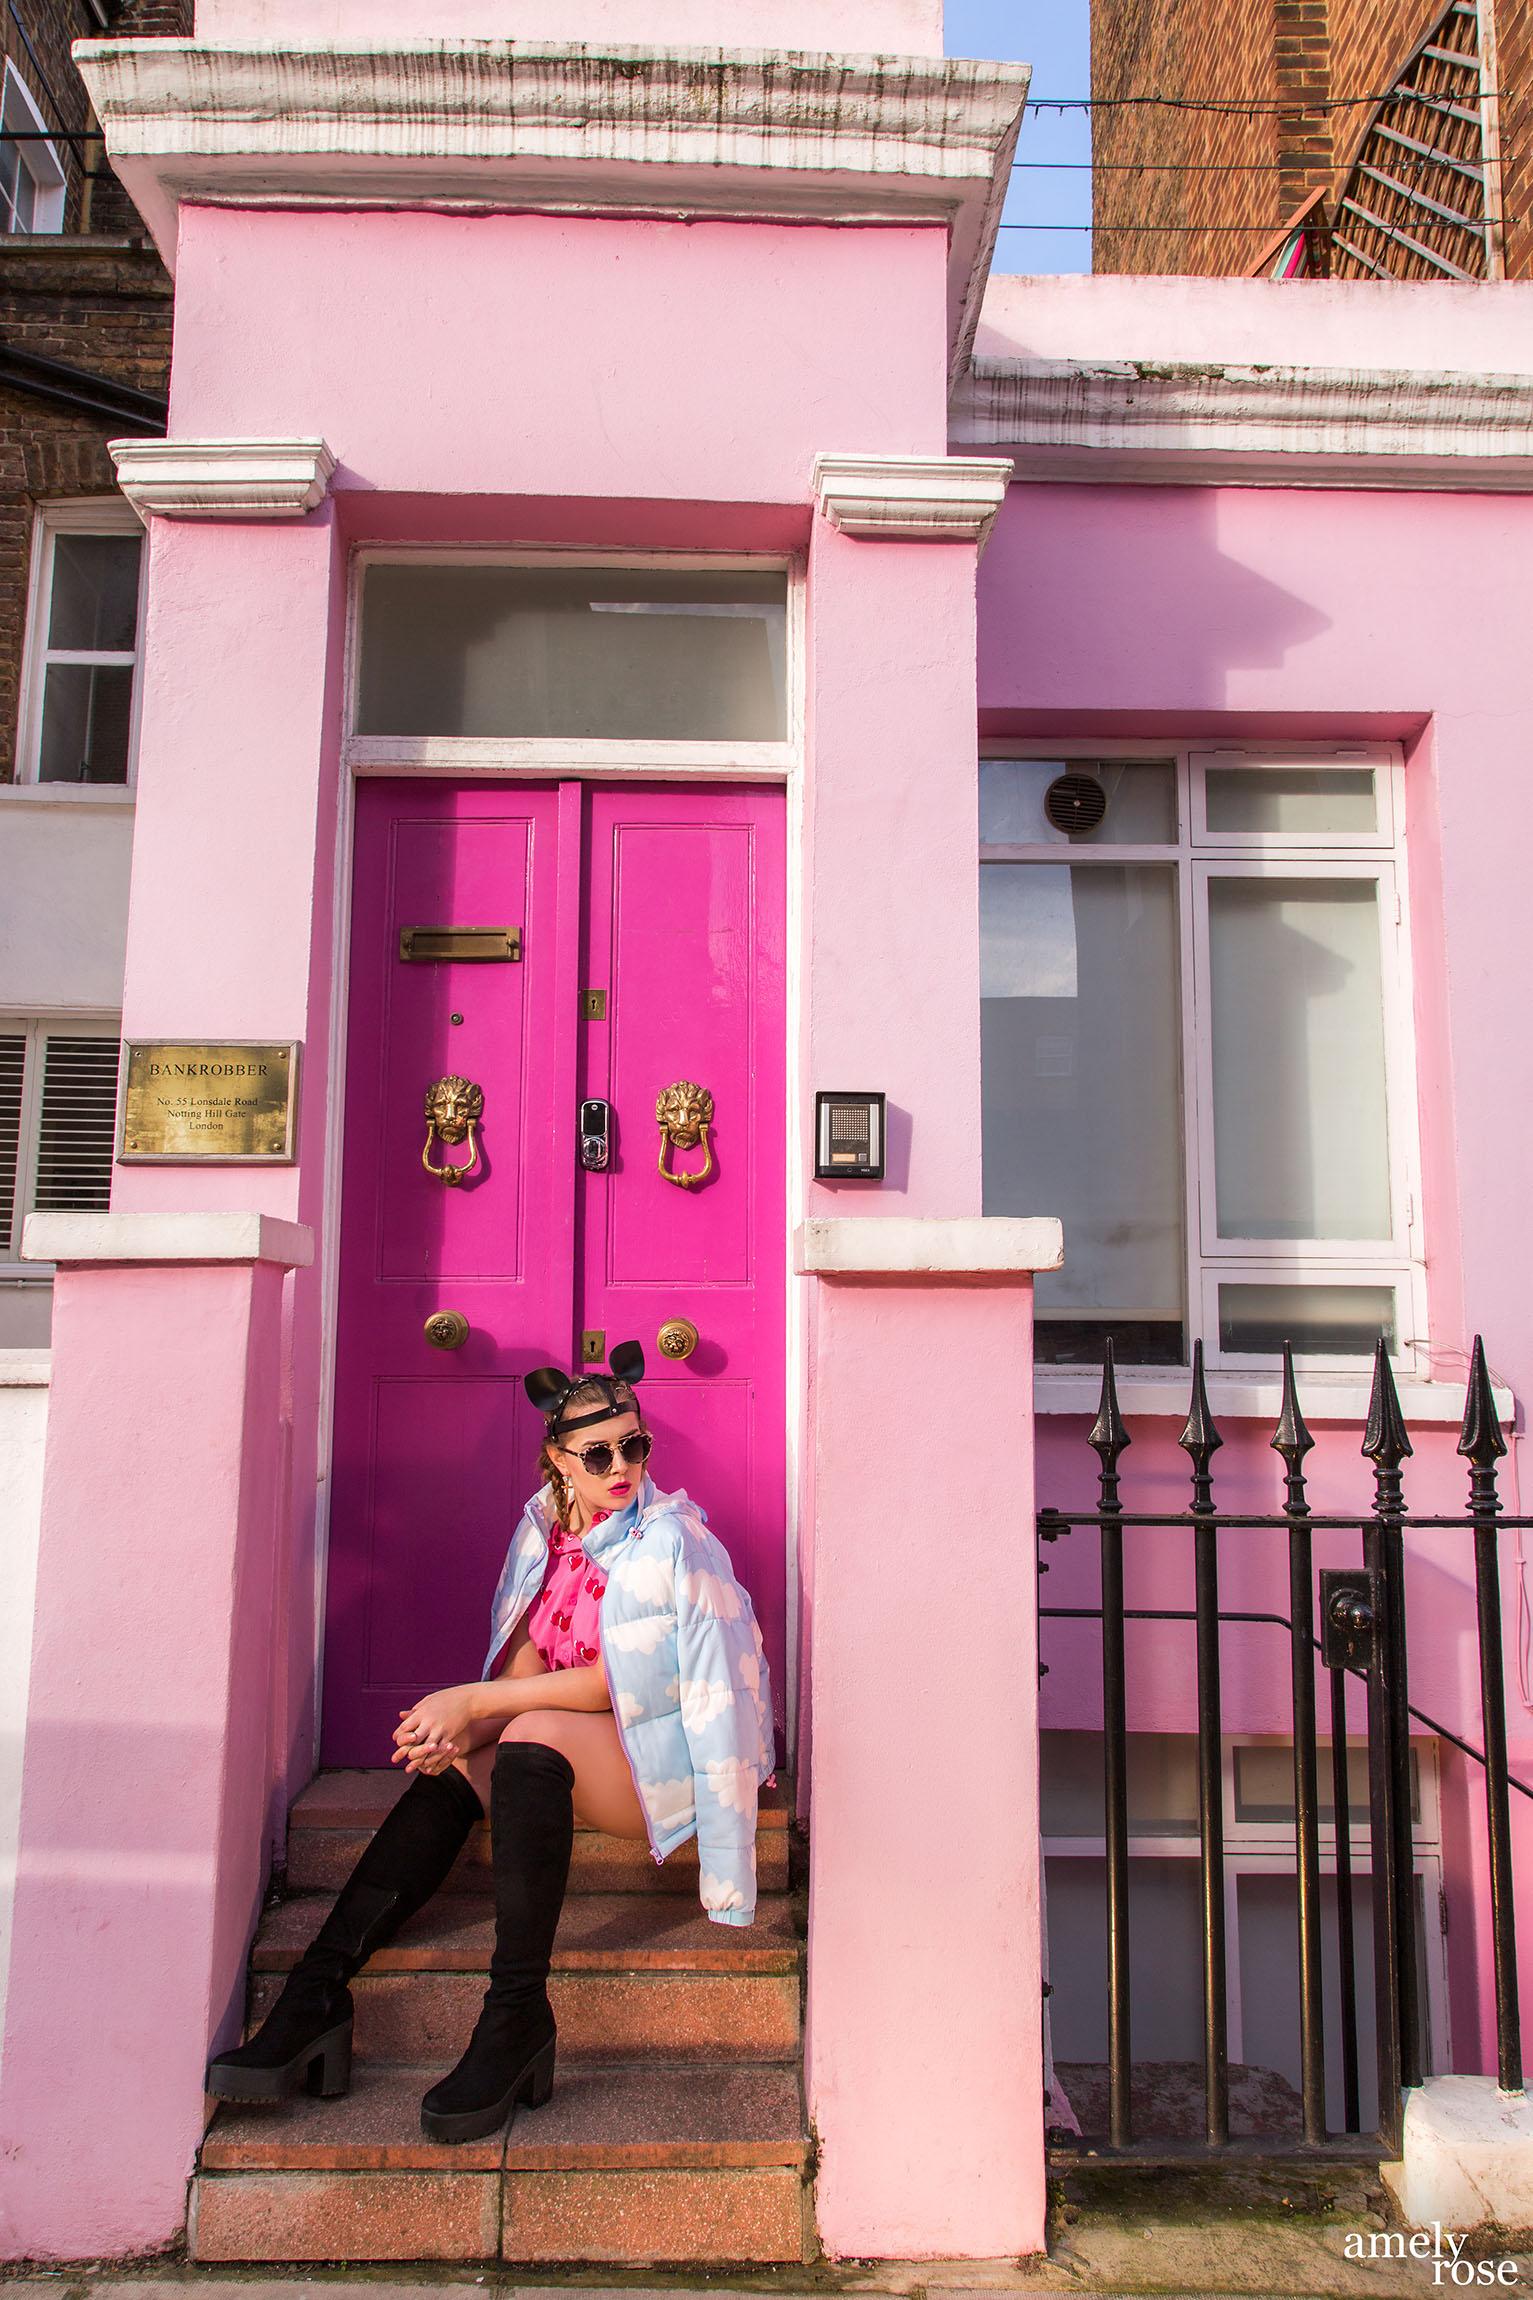 pinkes barbie Hause und Amely Rose in einer cloud Jacke